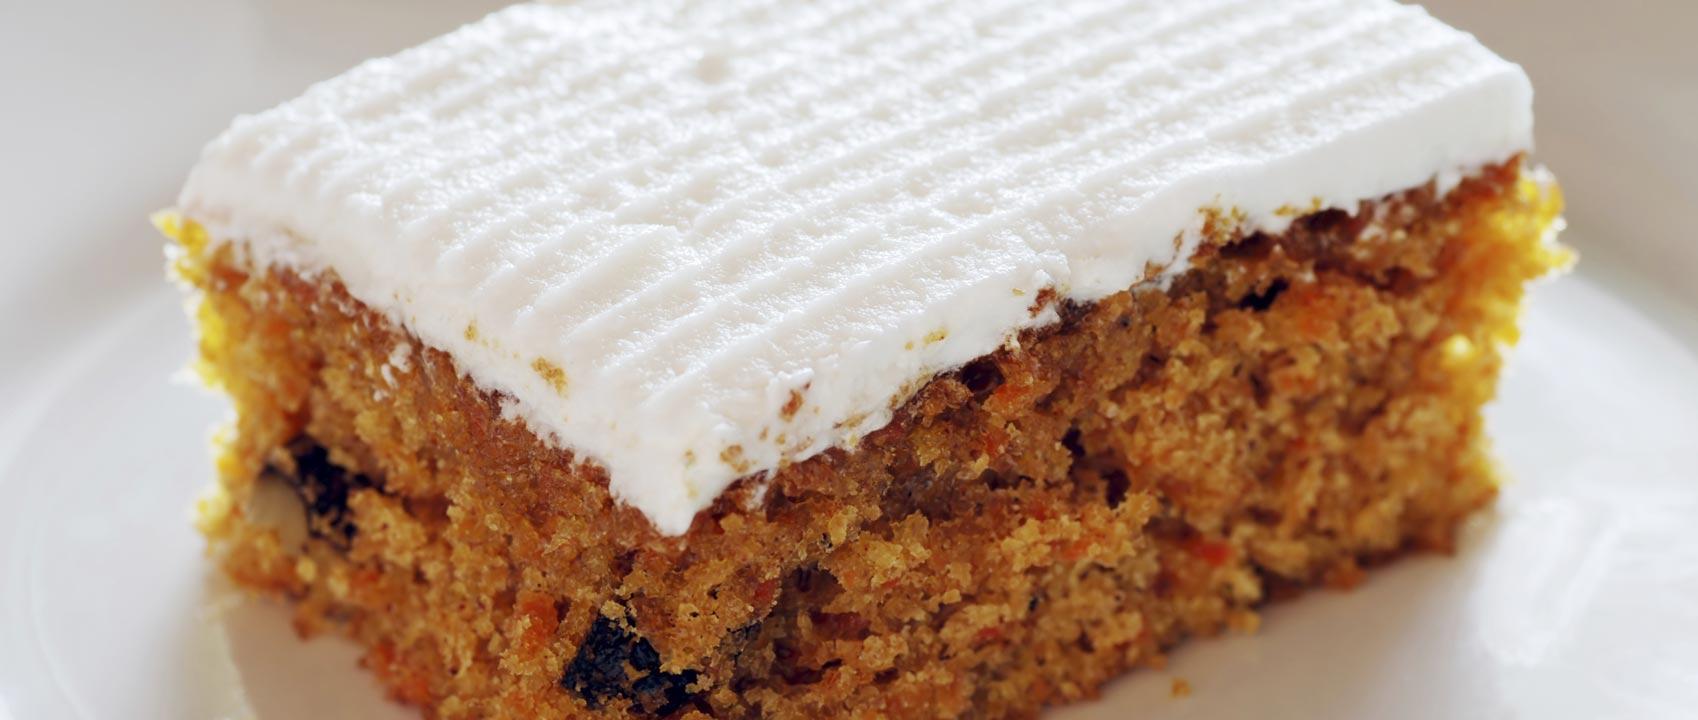 Carrot Cake Benefits